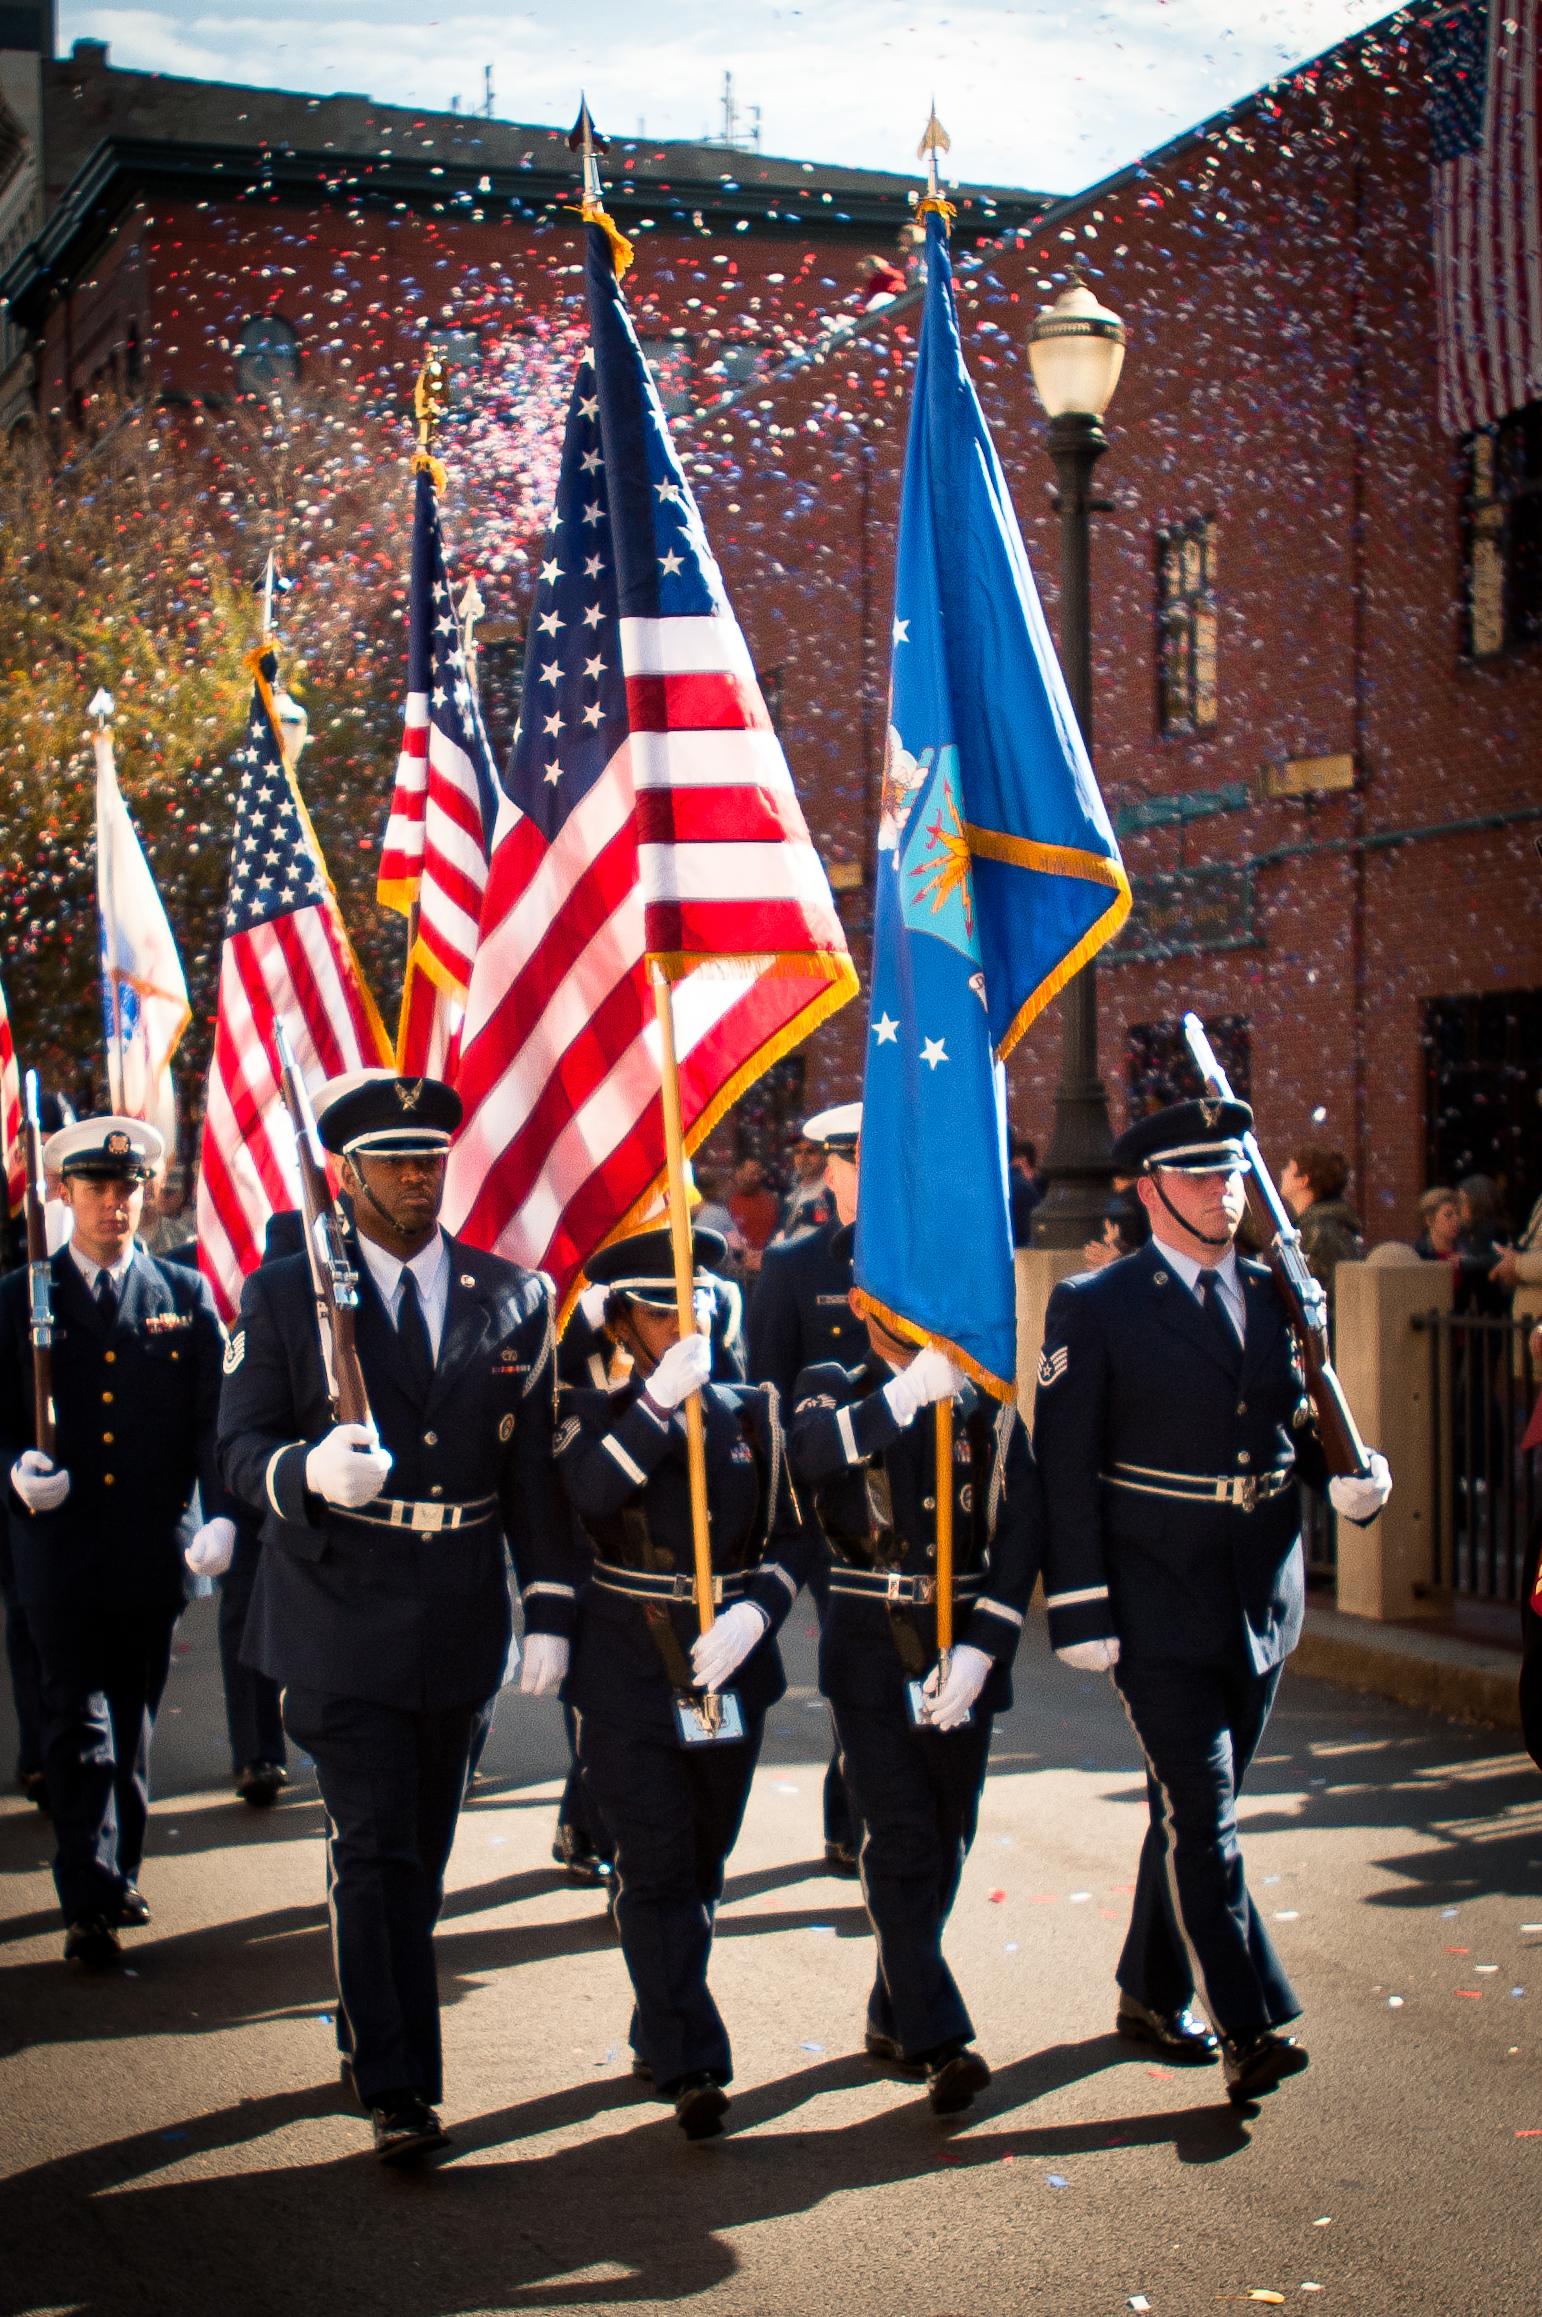 Veterans day freebies in louisville ky